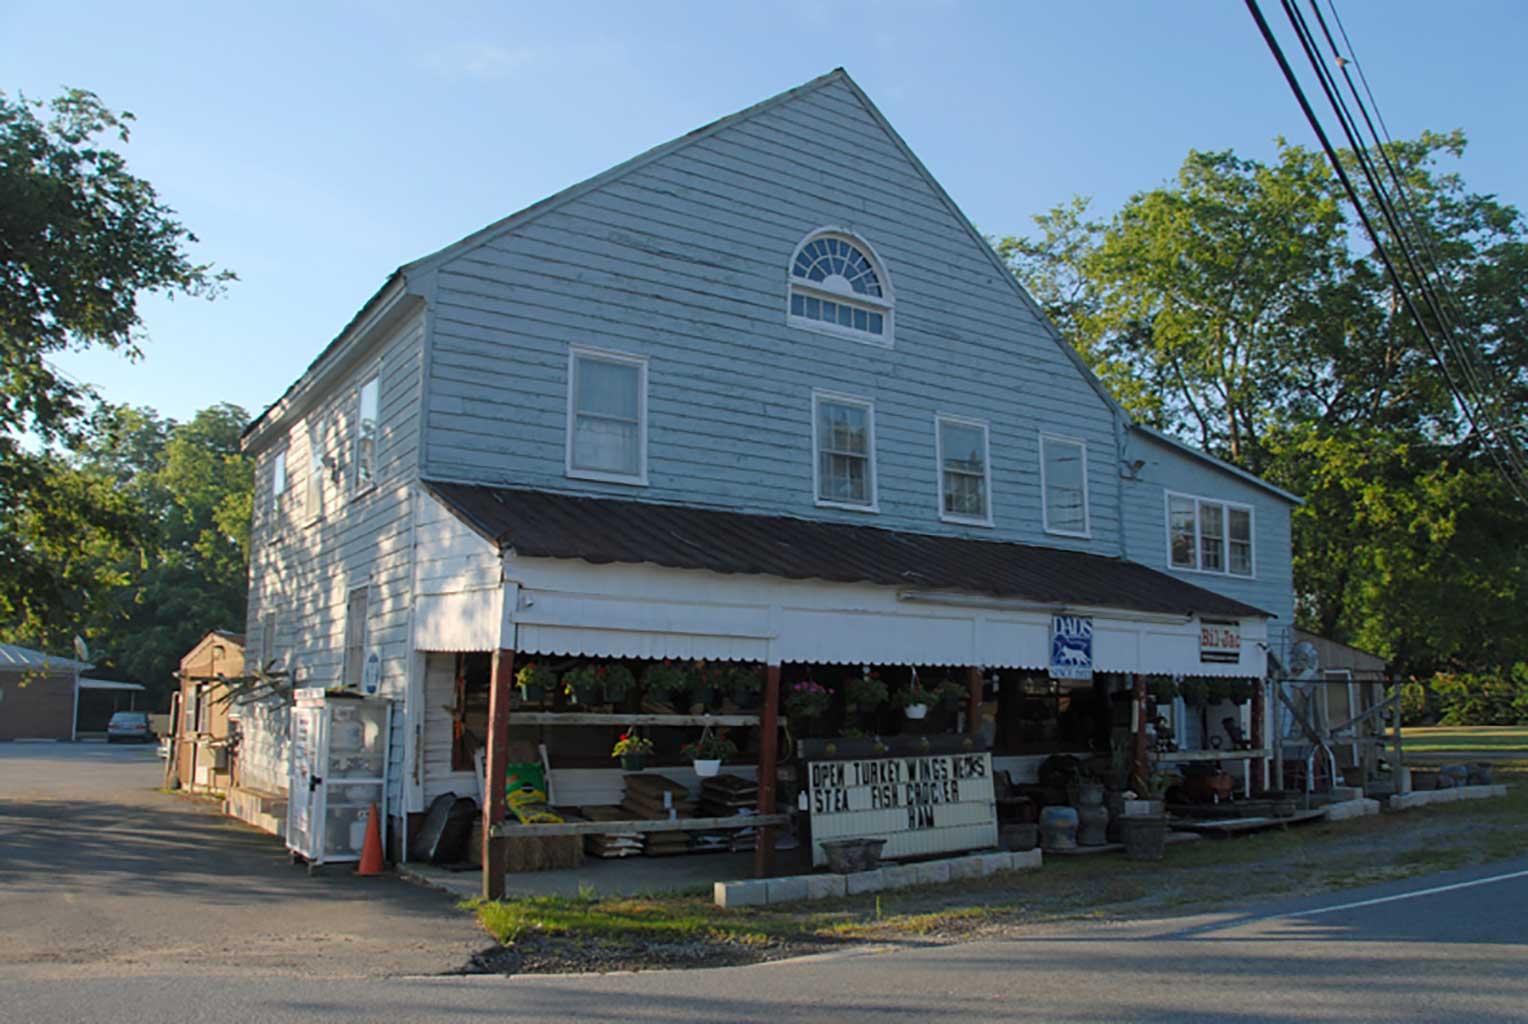 gwaltney-store-chuckatuck-va-7-14-2007-7-30-13-am-3872x2592